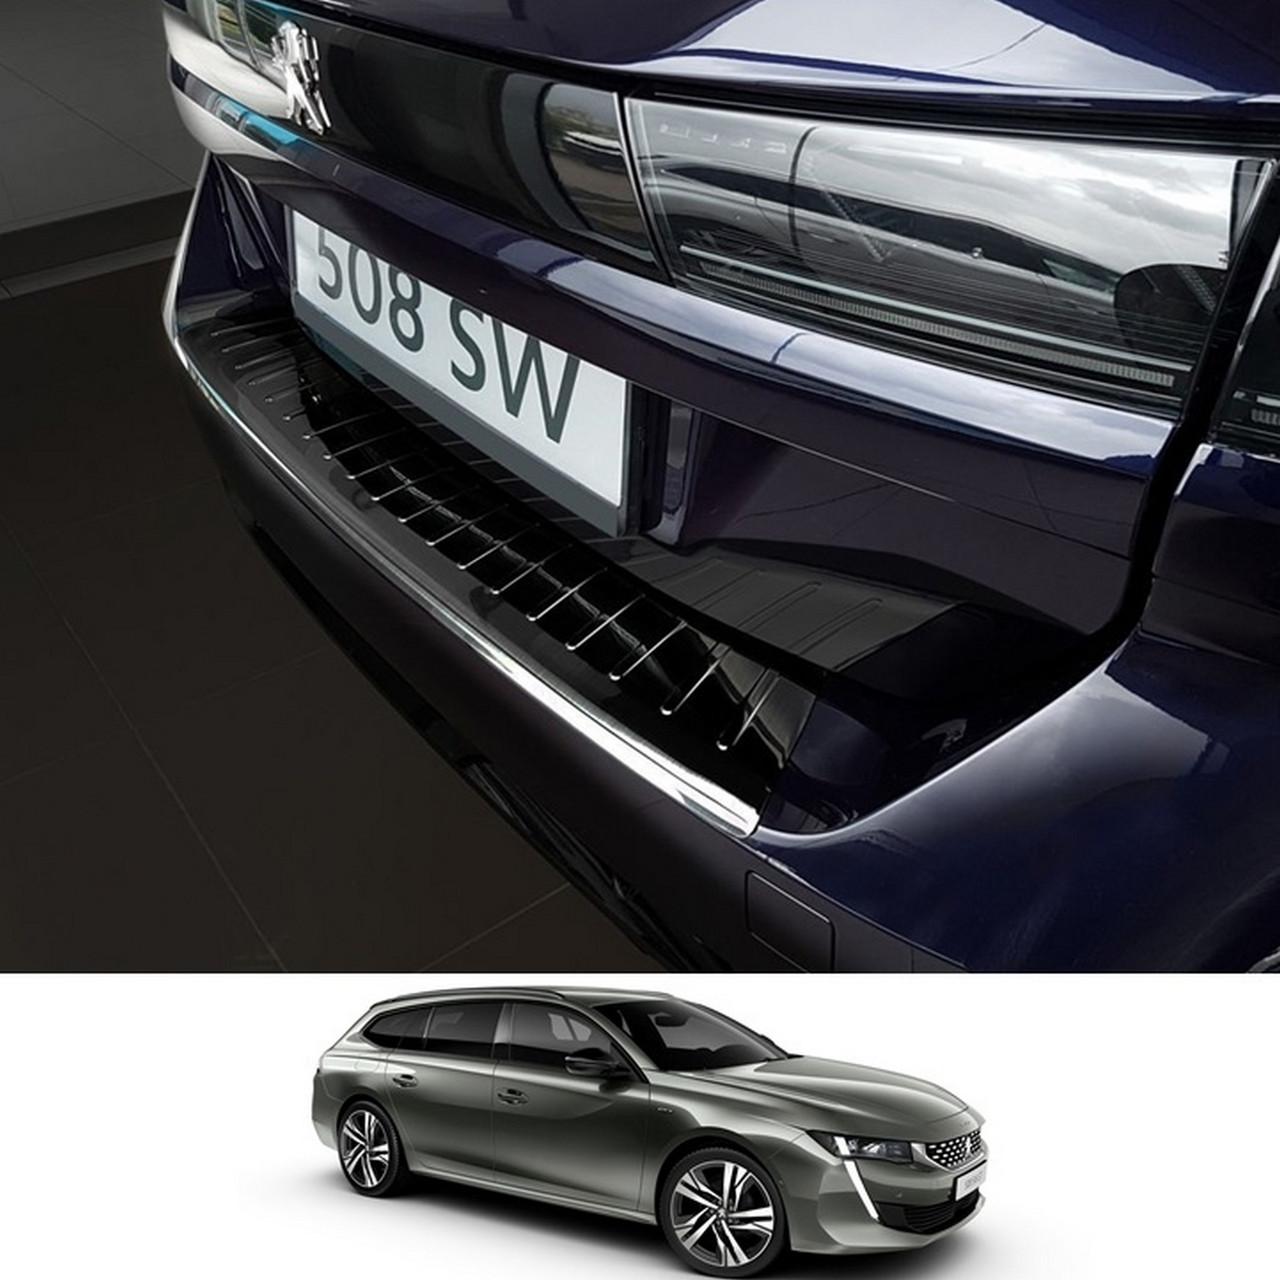 Захисна накладка на задній бампер для Peugeot 508 II SW 2018+ /чорна нерж.сталь/